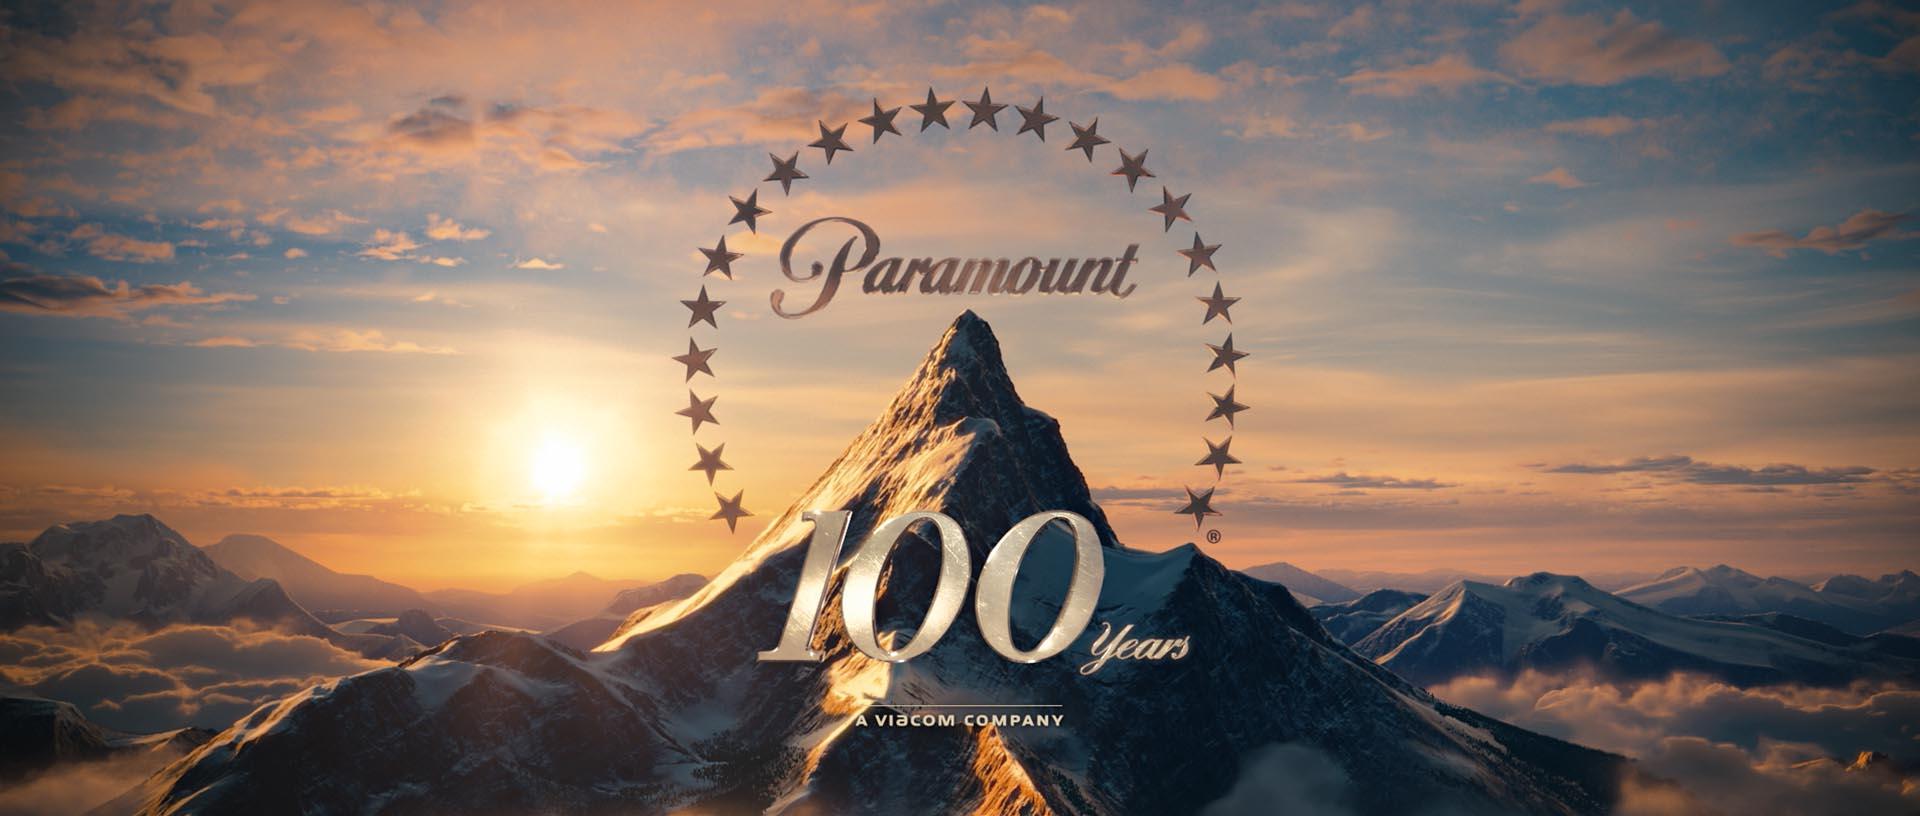 Paramount 100 Years – Devastudios